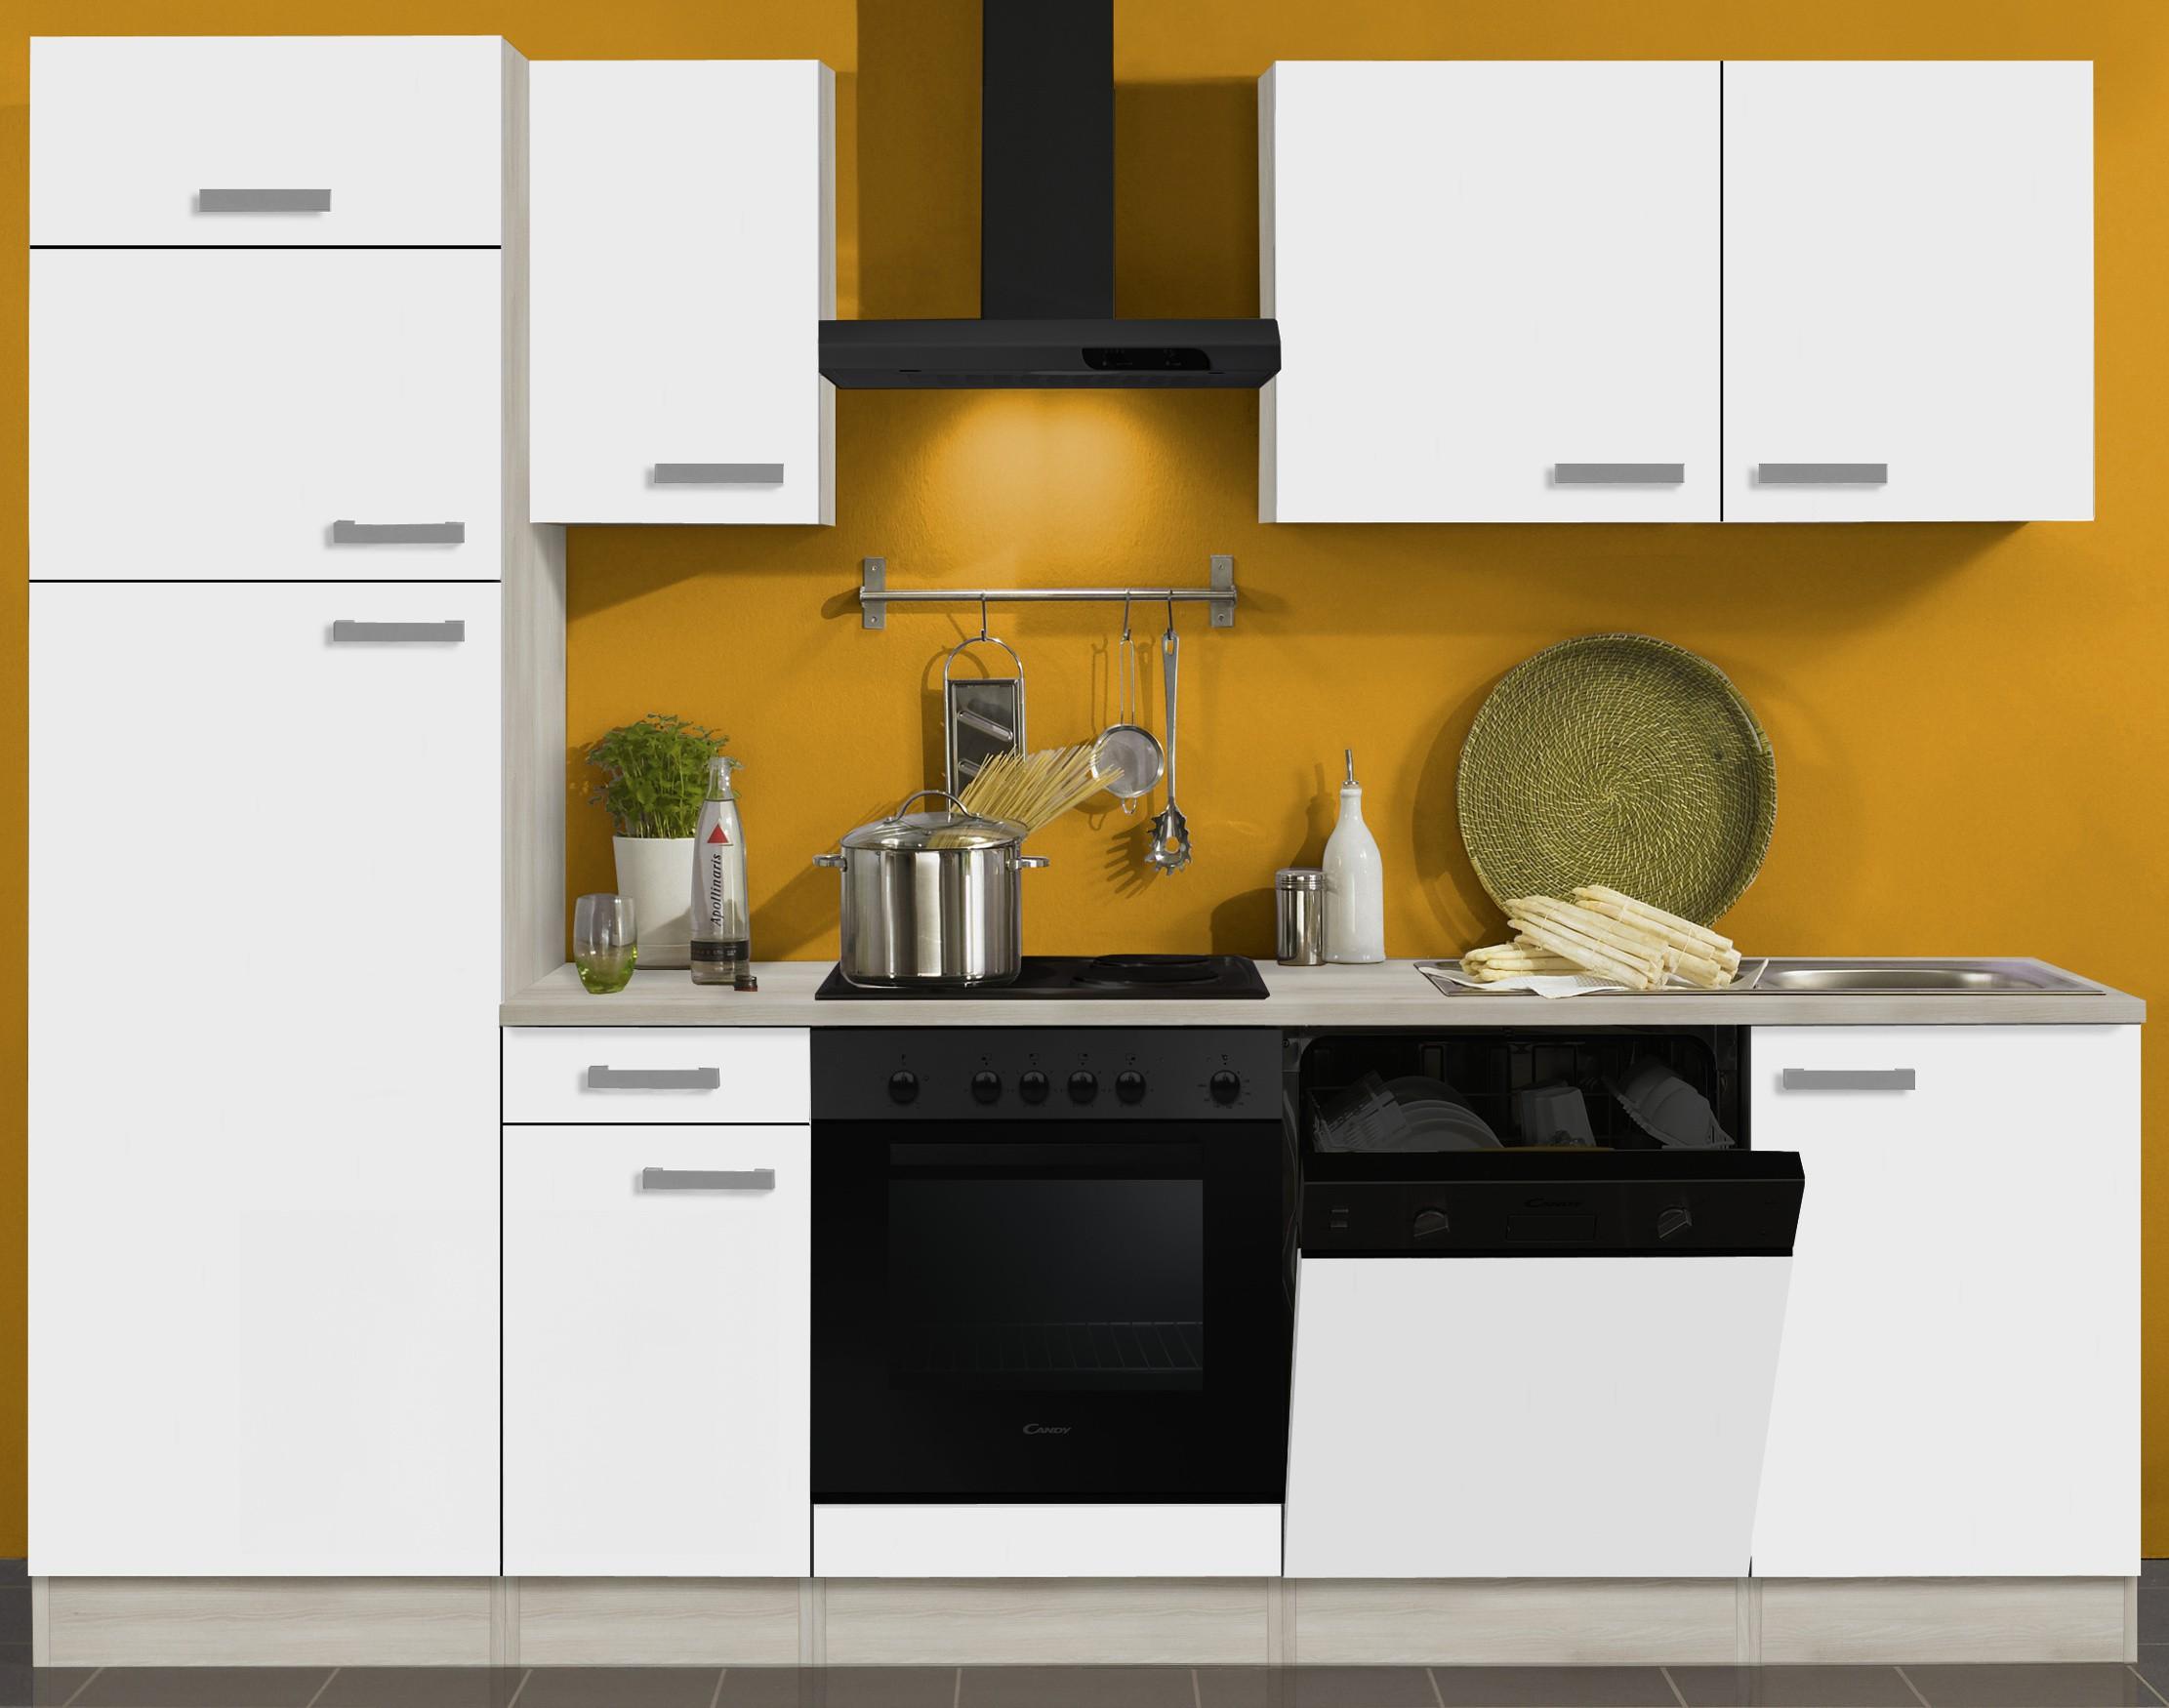 k che barcelona k chenzeile k chenblock k che ohne. Black Bedroom Furniture Sets. Home Design Ideas